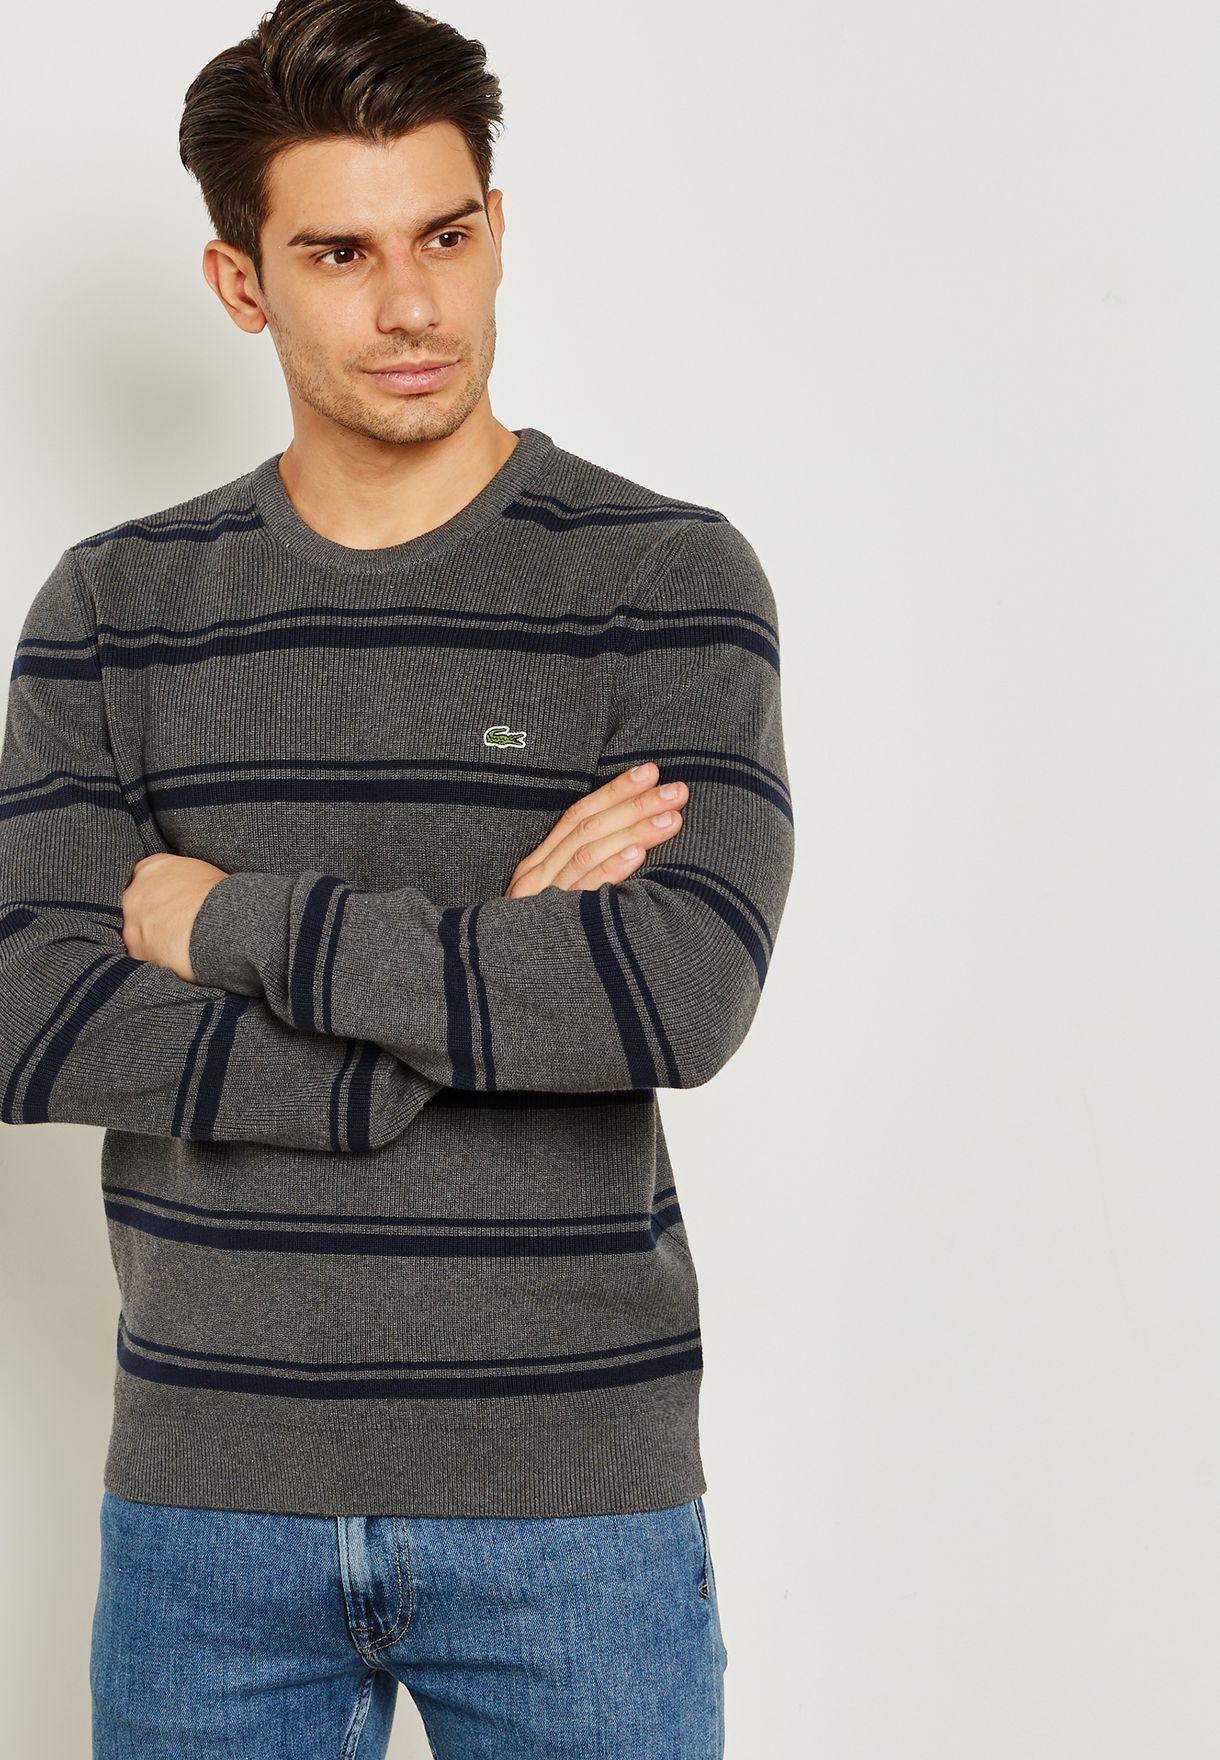 2d7808a64589 Shop Lacoste grey Striped Sweater AH9692-00 BX4 for Men in UAE ...